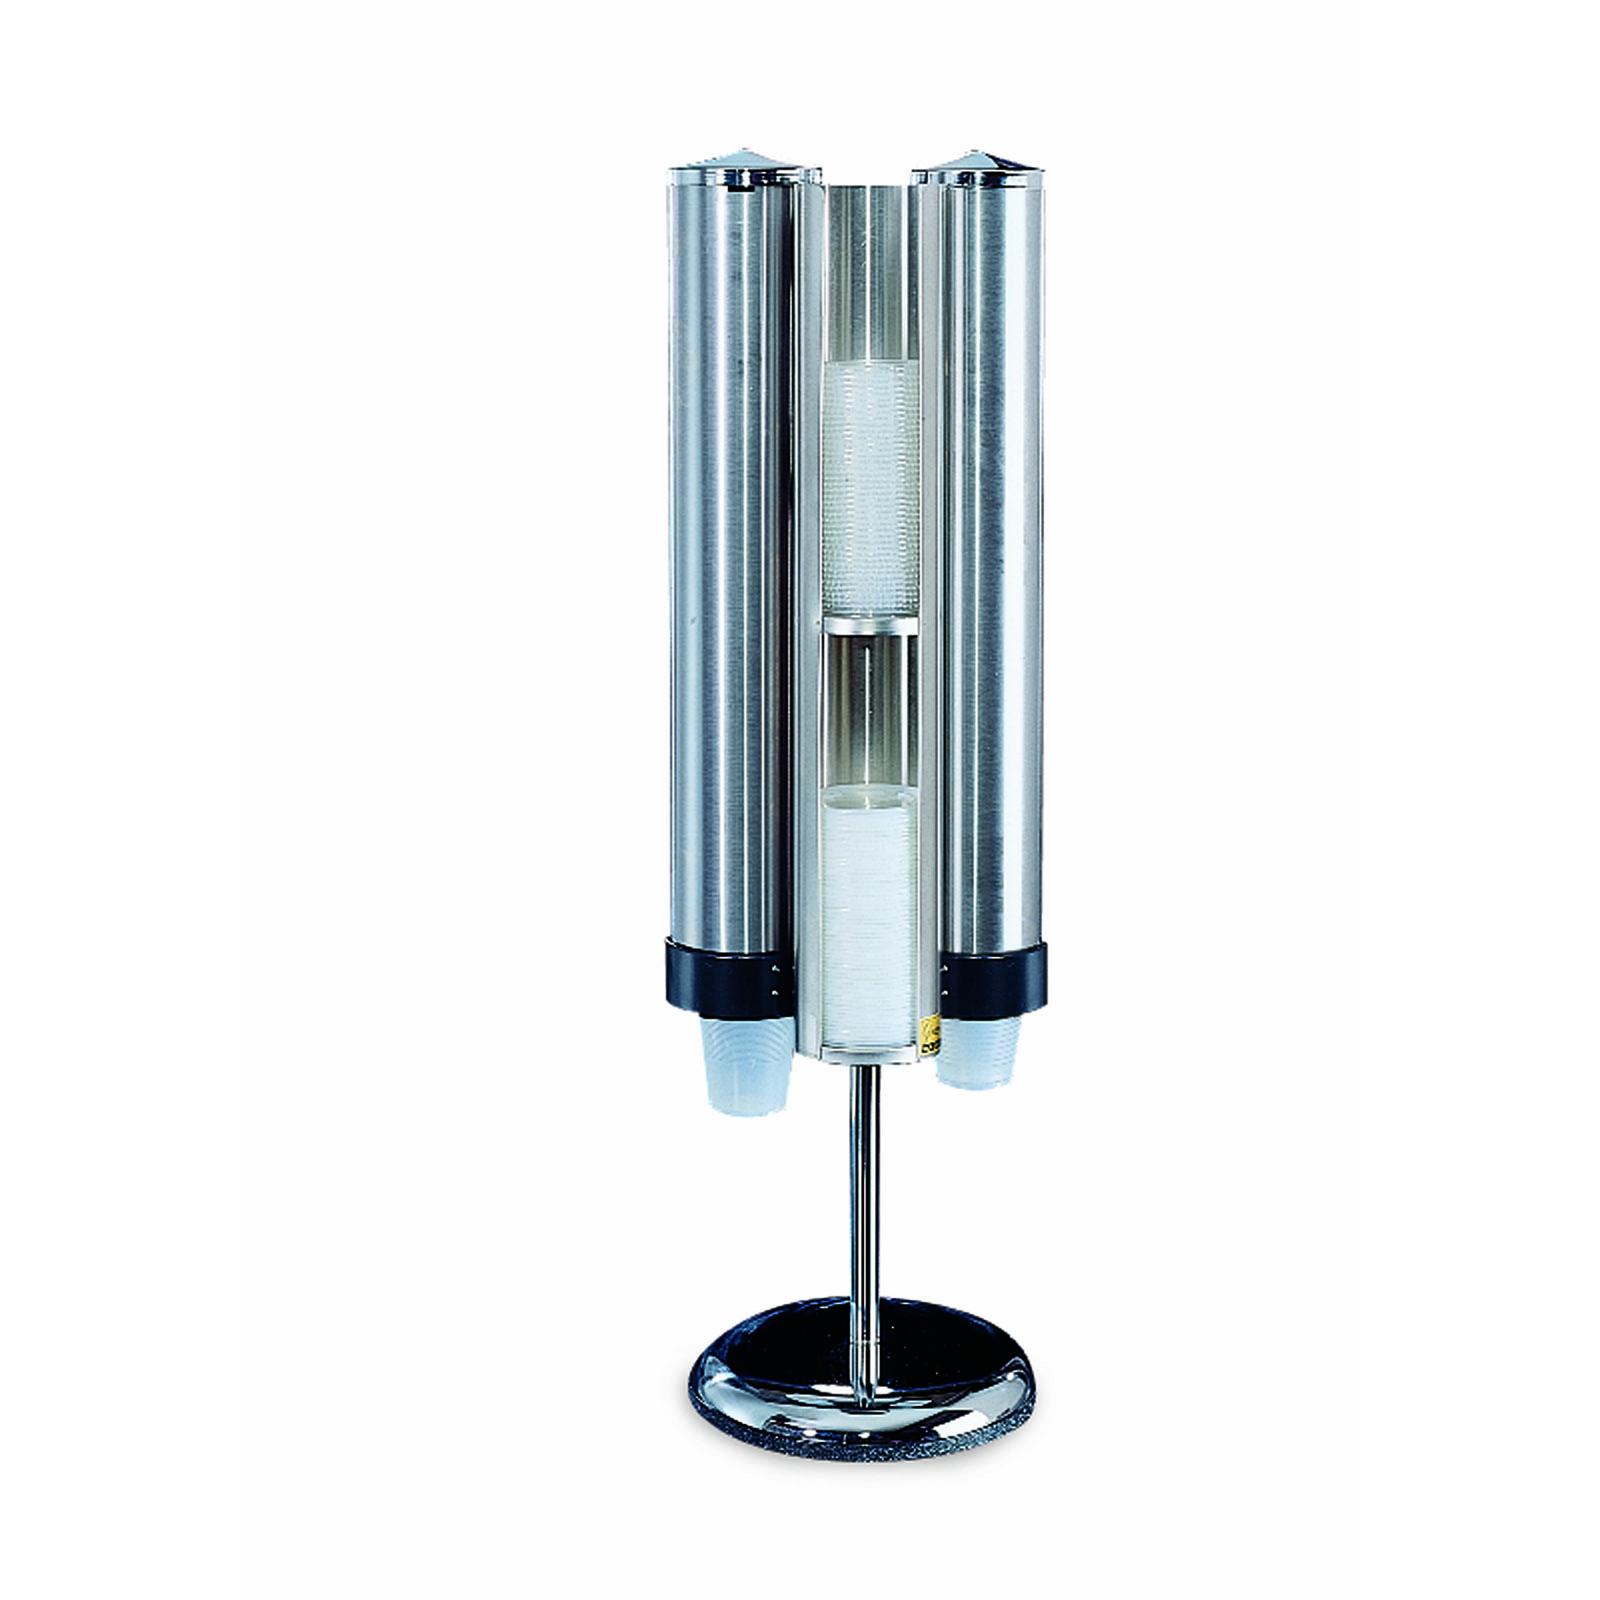 San Jamar C3620 cup dispensers, countertop